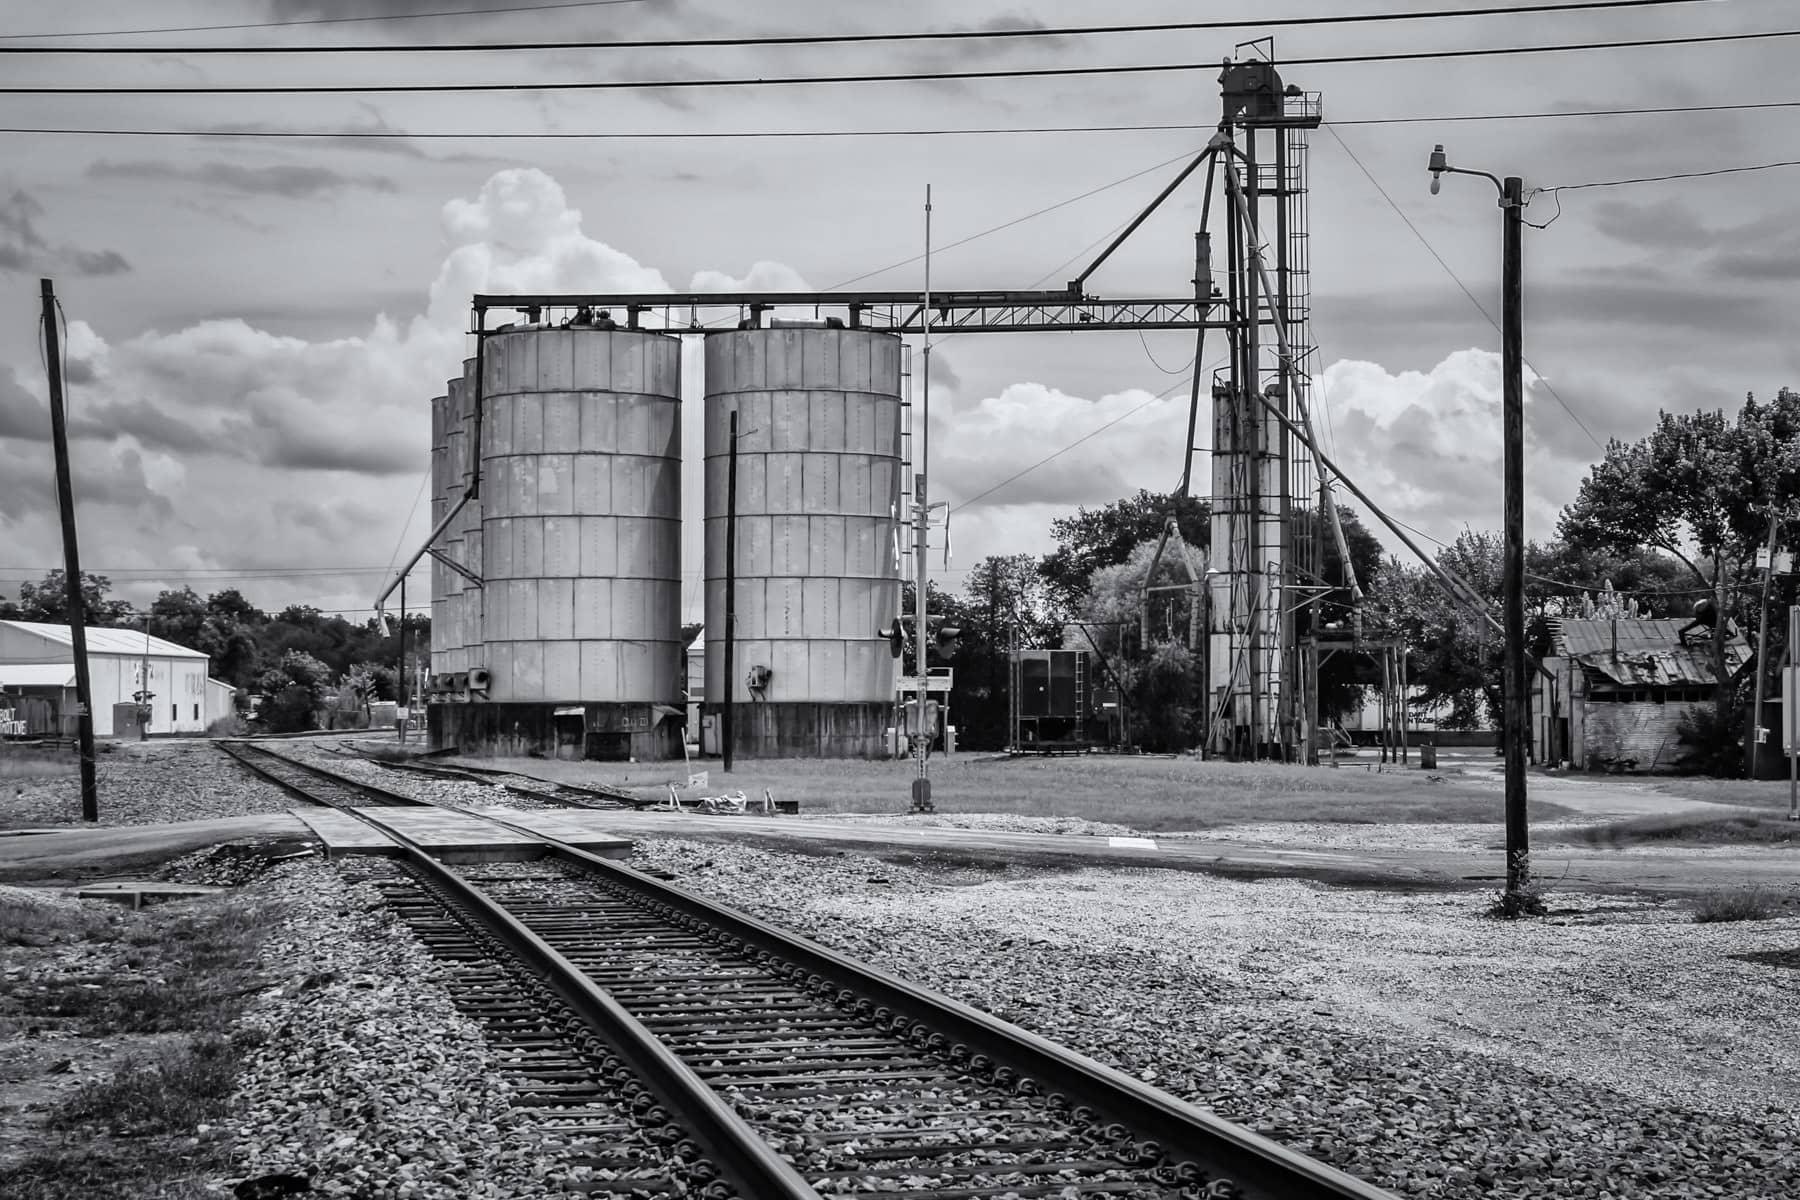 Silos and railroad tracks in Waxahachie, Texas.